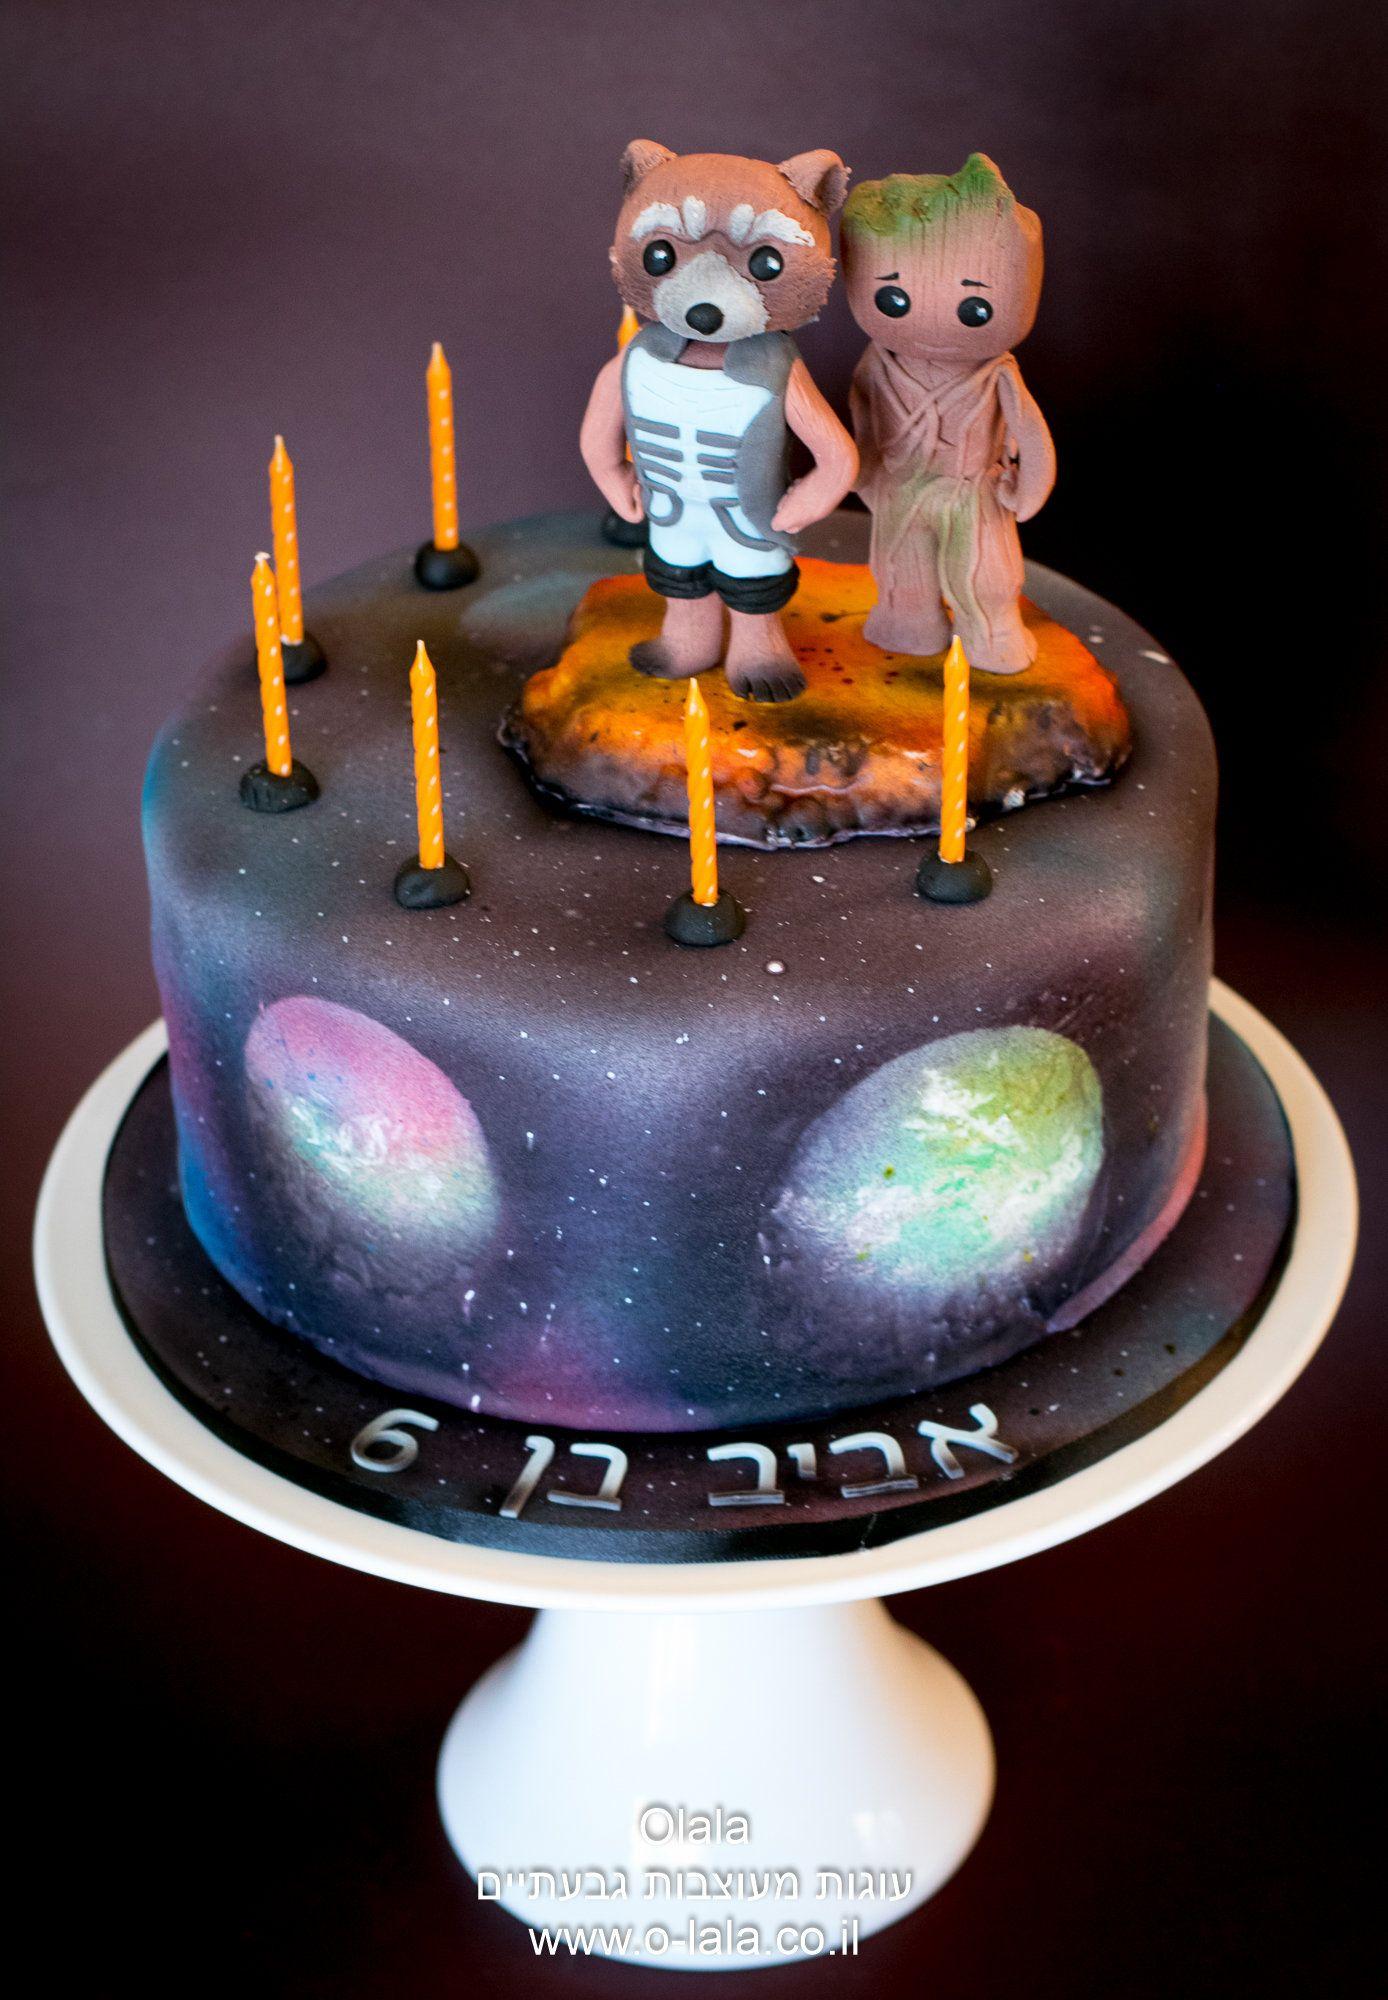 the guardians of the galaxy cake   Cakes by Olala - עוגות מעוצבות ...